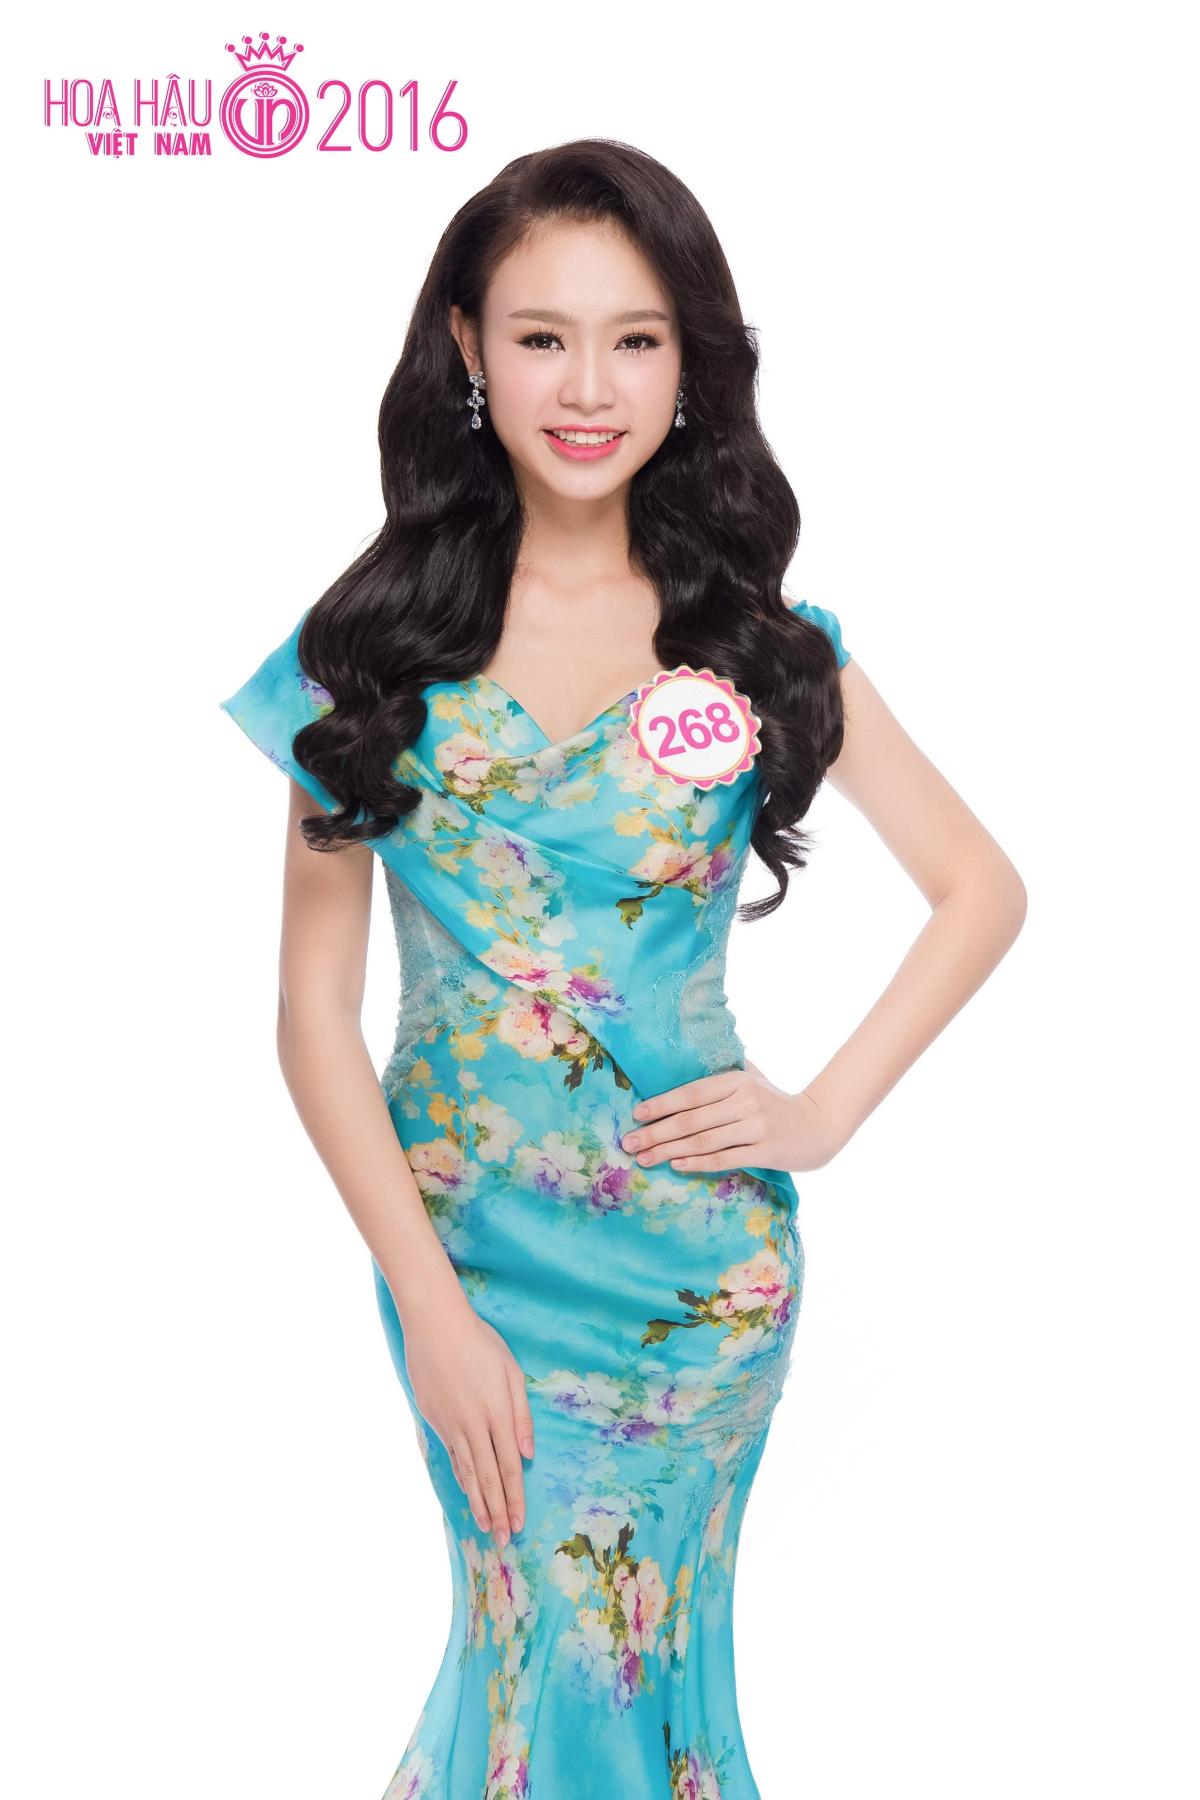 268 - Phung Bao Ngoc Van 1